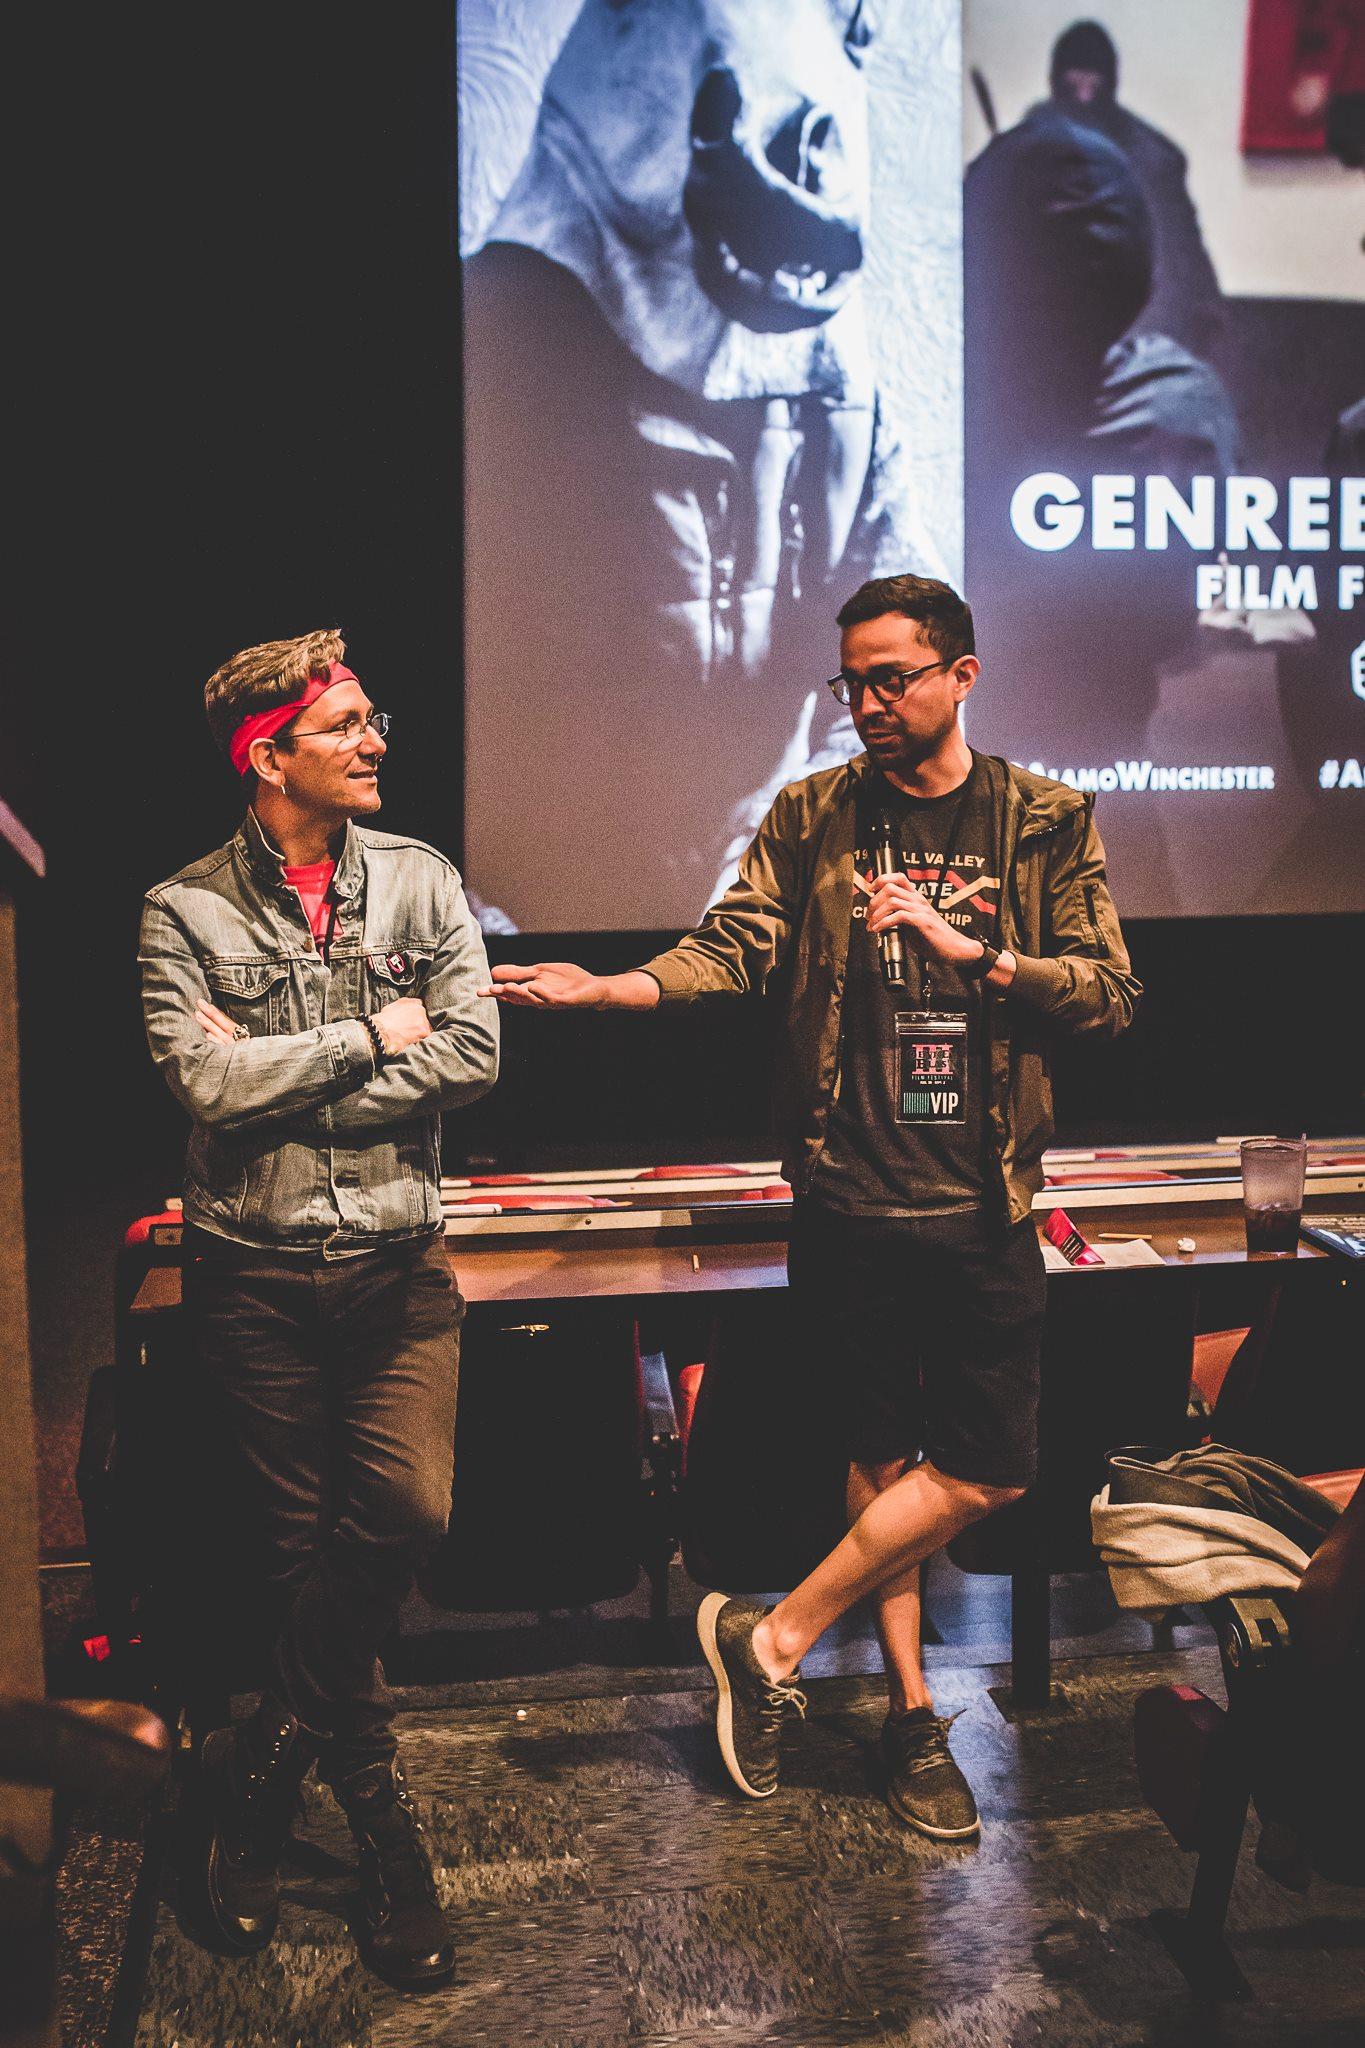 Filmmakers Saba (left) and Eliaz Rodriguez (right) chat between screenings at GenreBlast 2018.